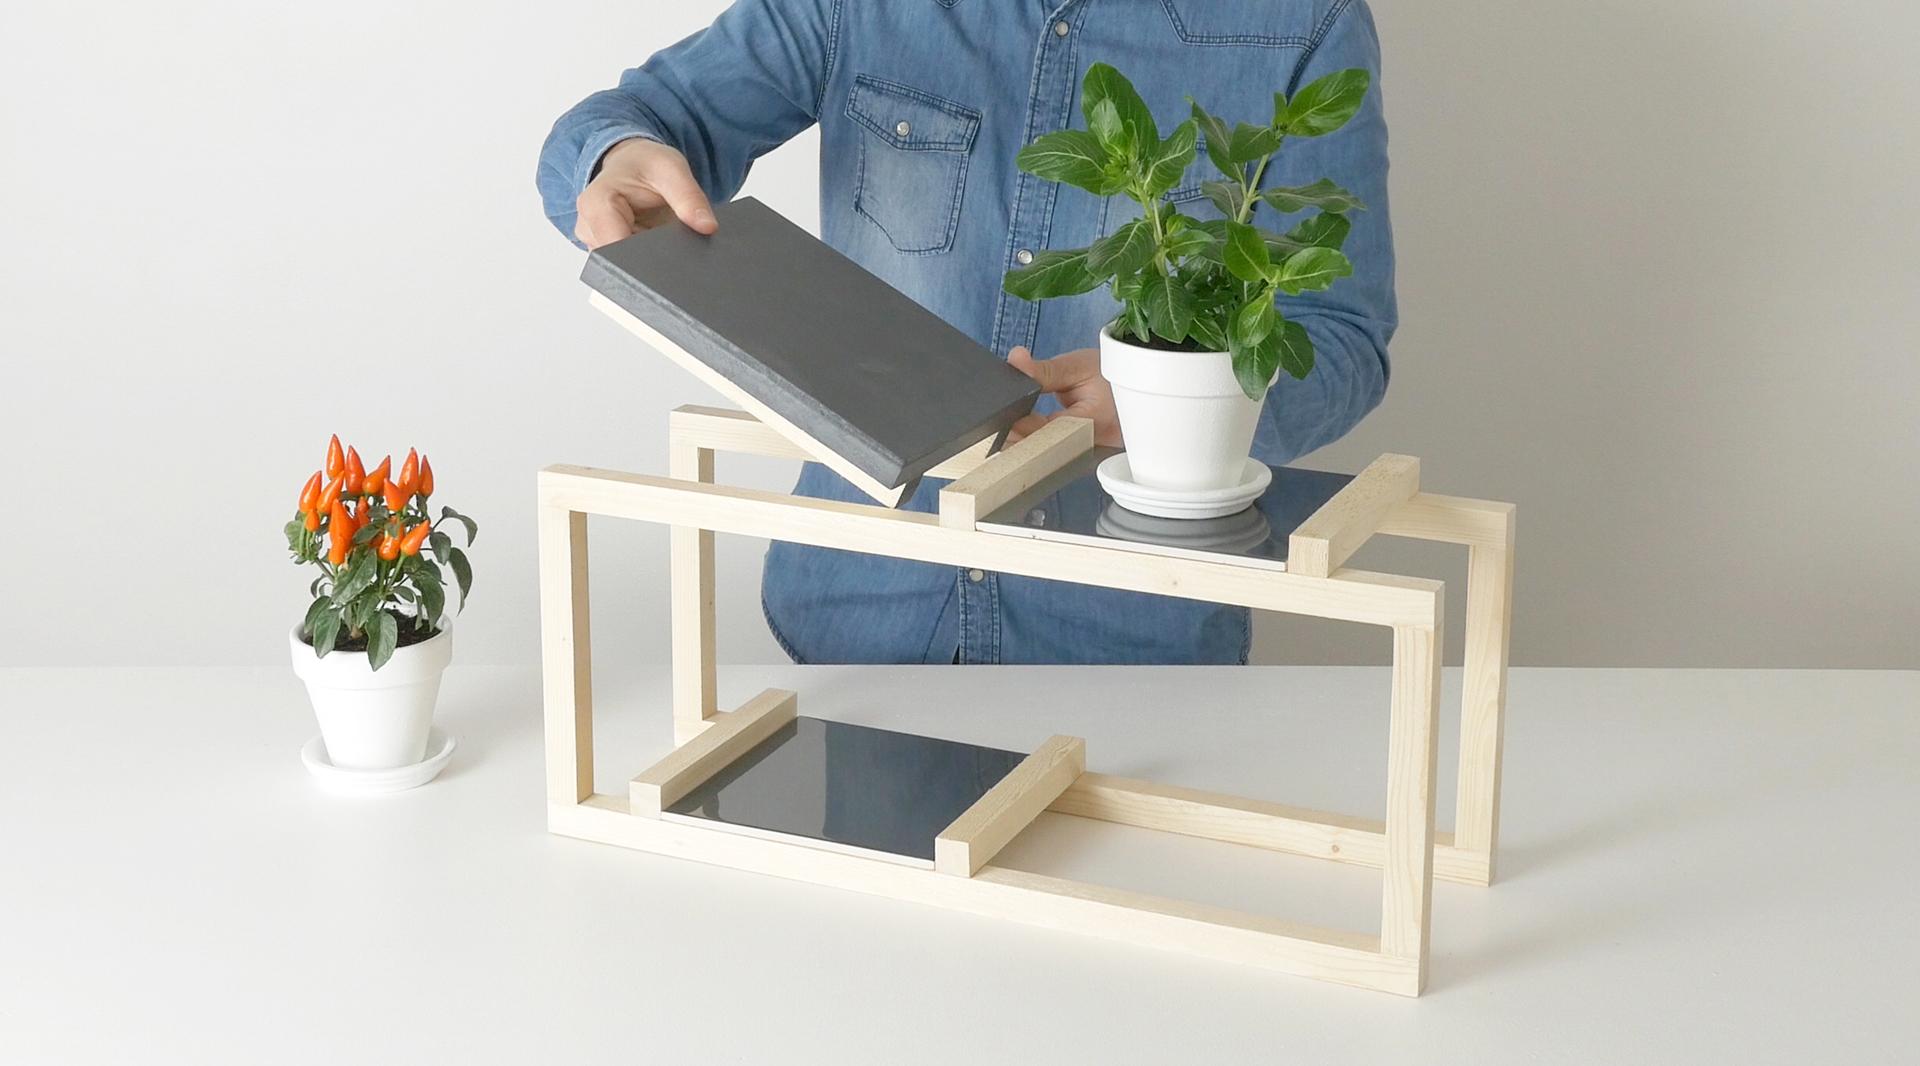 pierrelota_meuble_plantes_1_image10